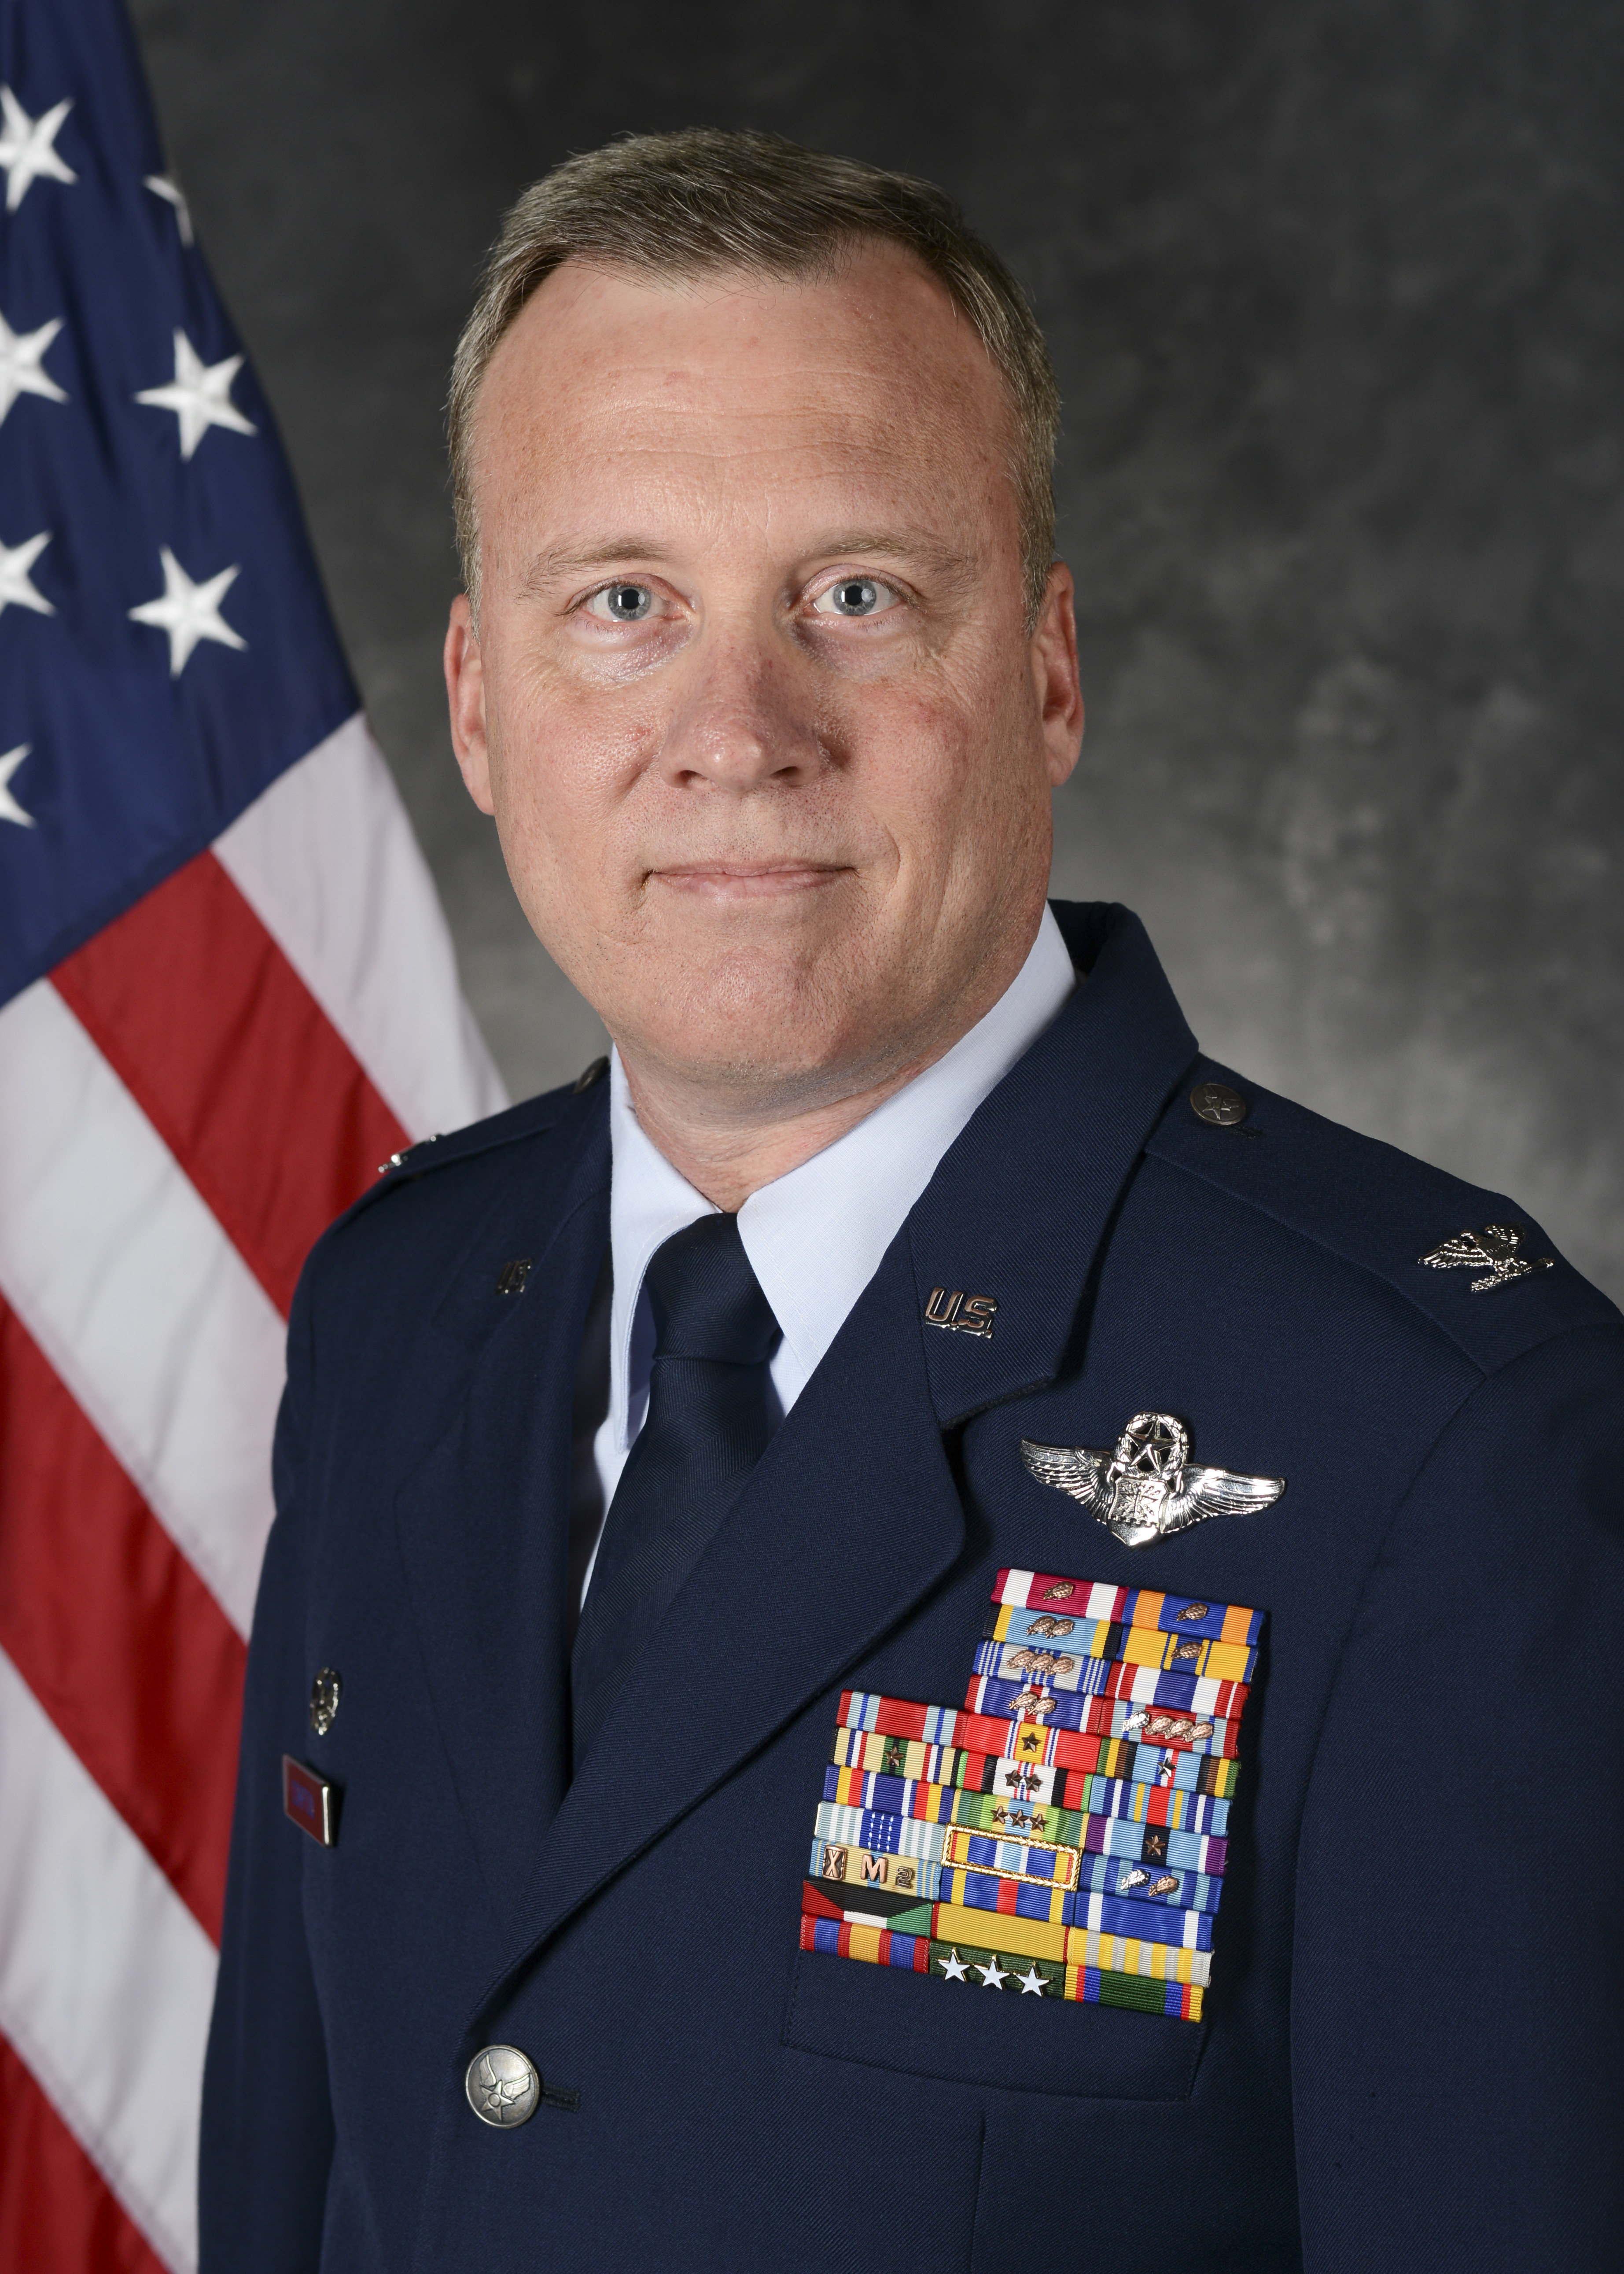 Lt. Col. David W. Compton